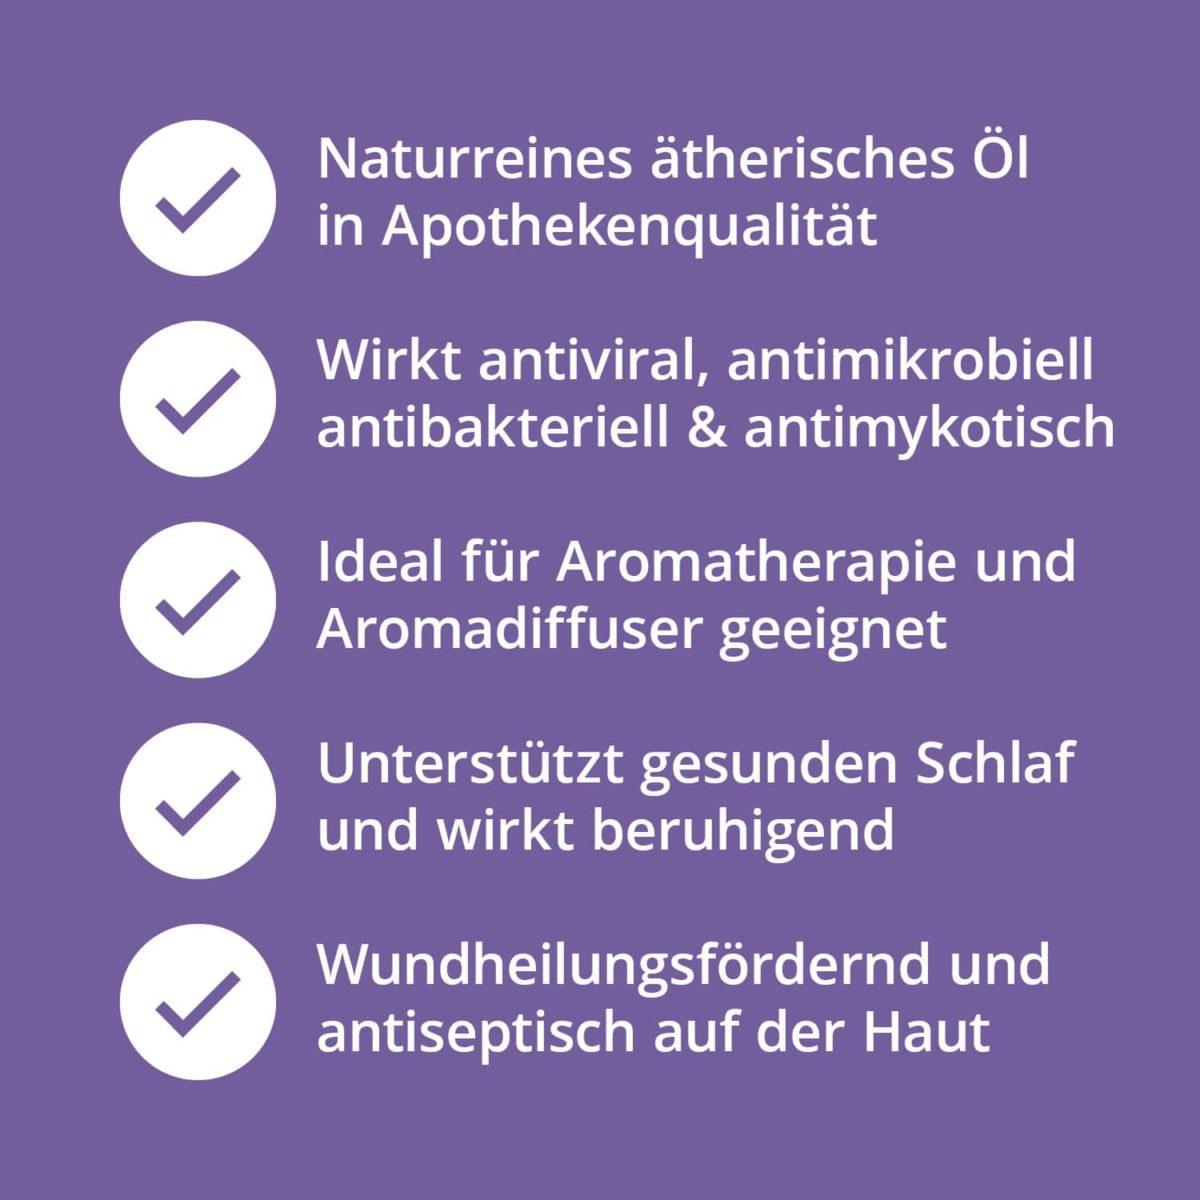 Casida Lavendelöl naturrein – 10 ml 15880722 PZN Apotheke Lavandula angustifolia Diffuser pur anwenden Schlaf Beruhigung (9)